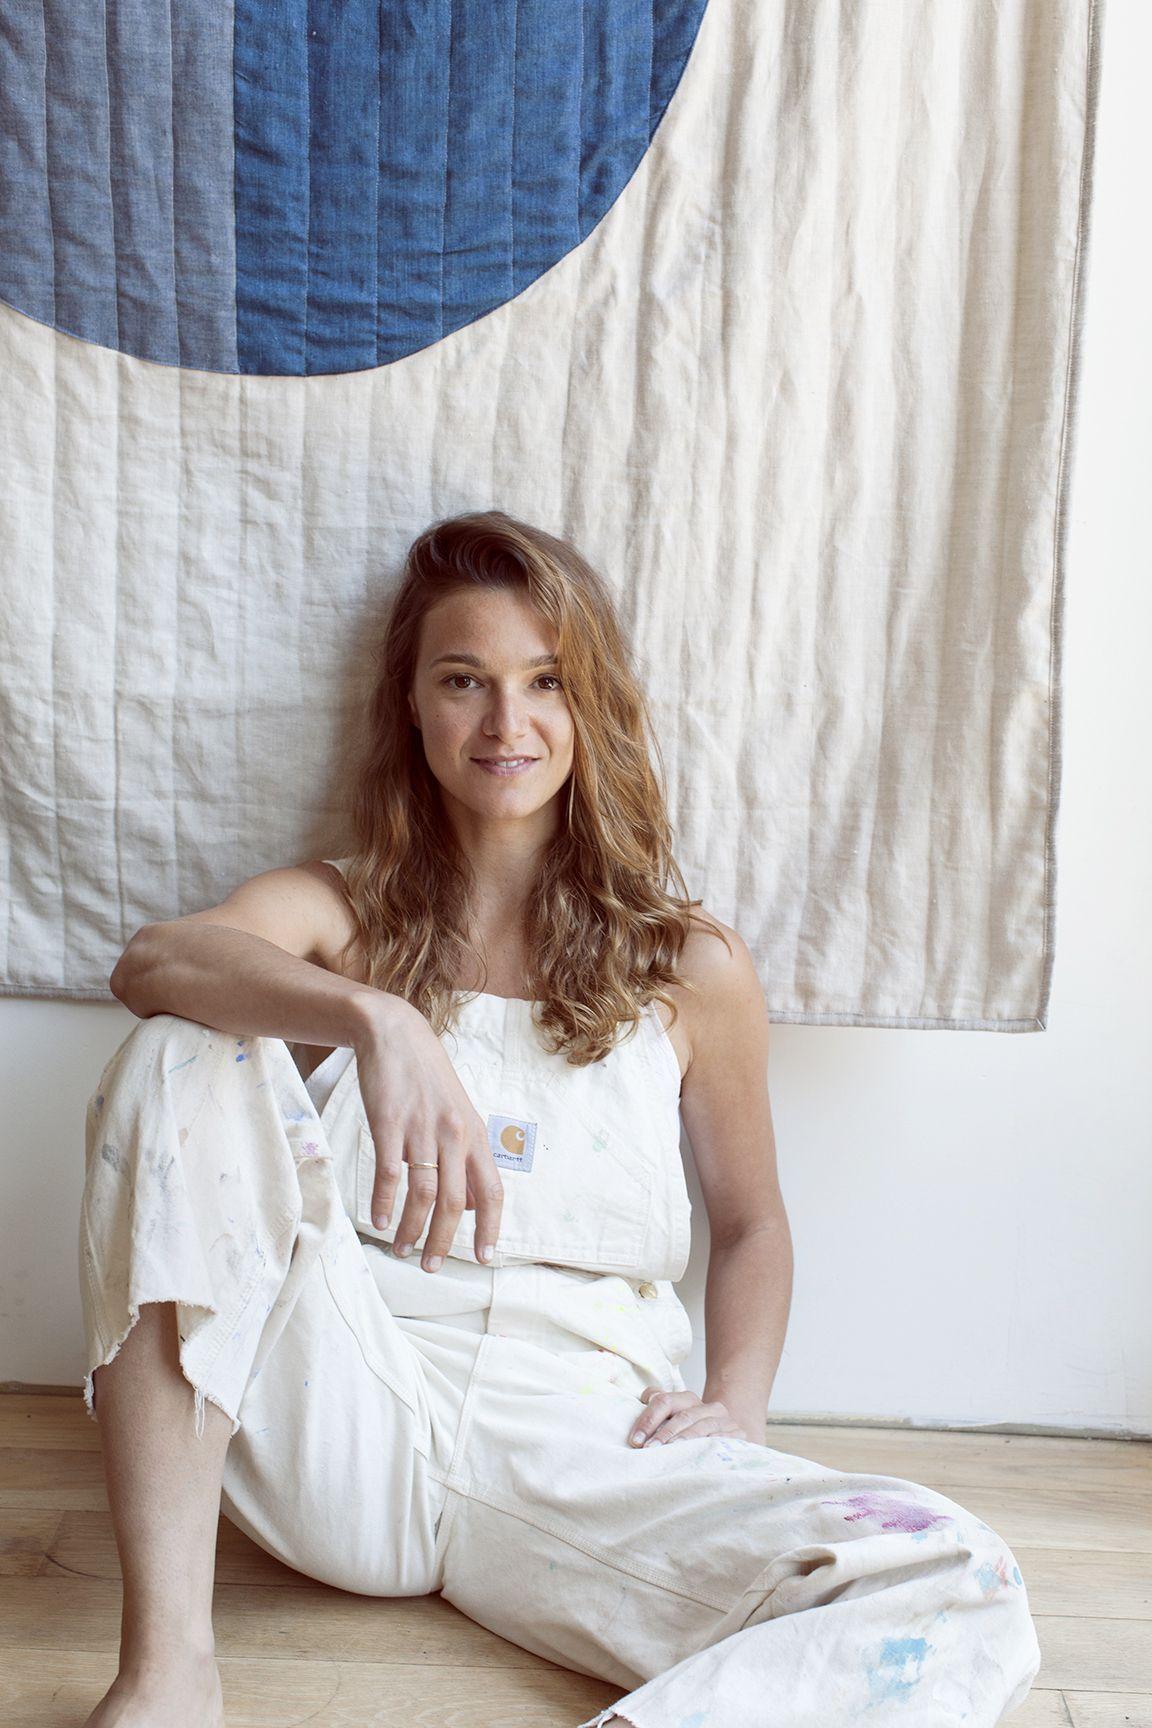 Caroline Zucchero Hurley, Artist + Home Goods Designer | Hurley